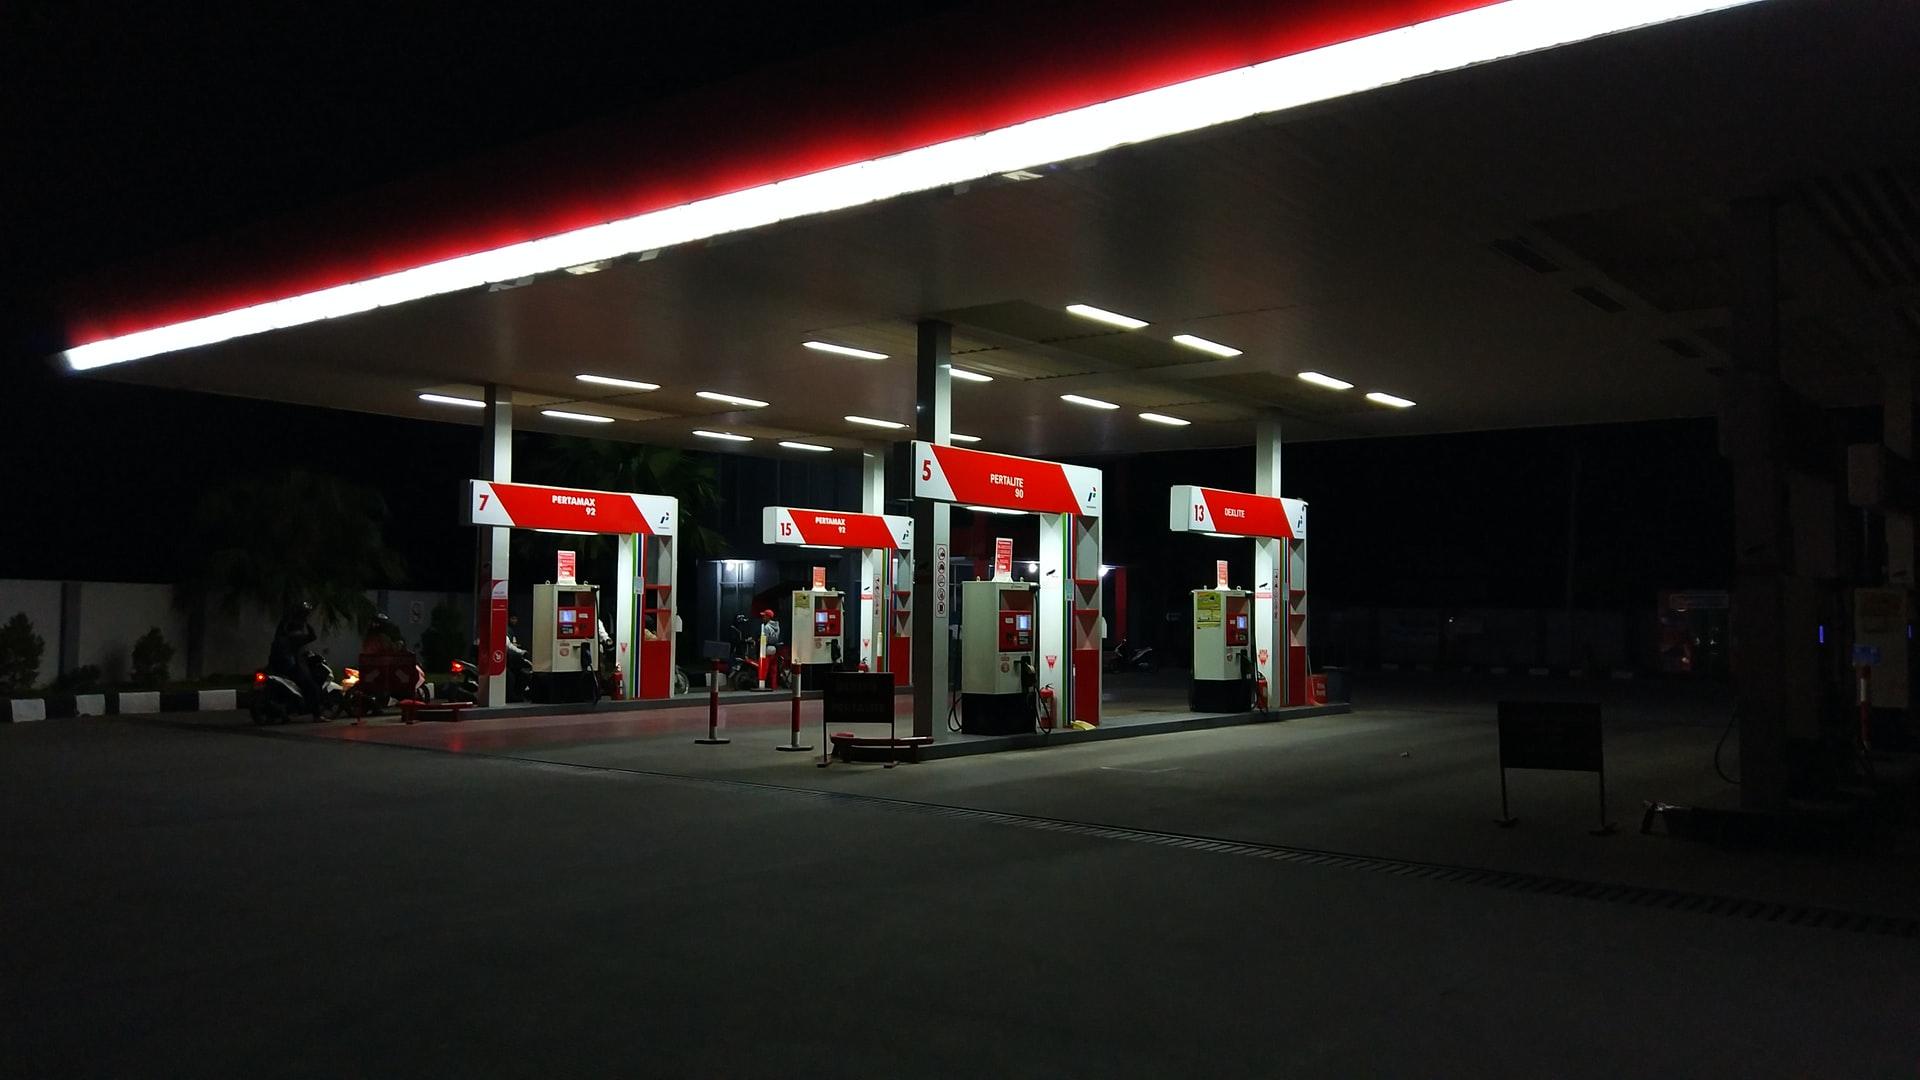 Hot U.S. Economy Pushes Gasoline Prices Close To $3 Per Gallon